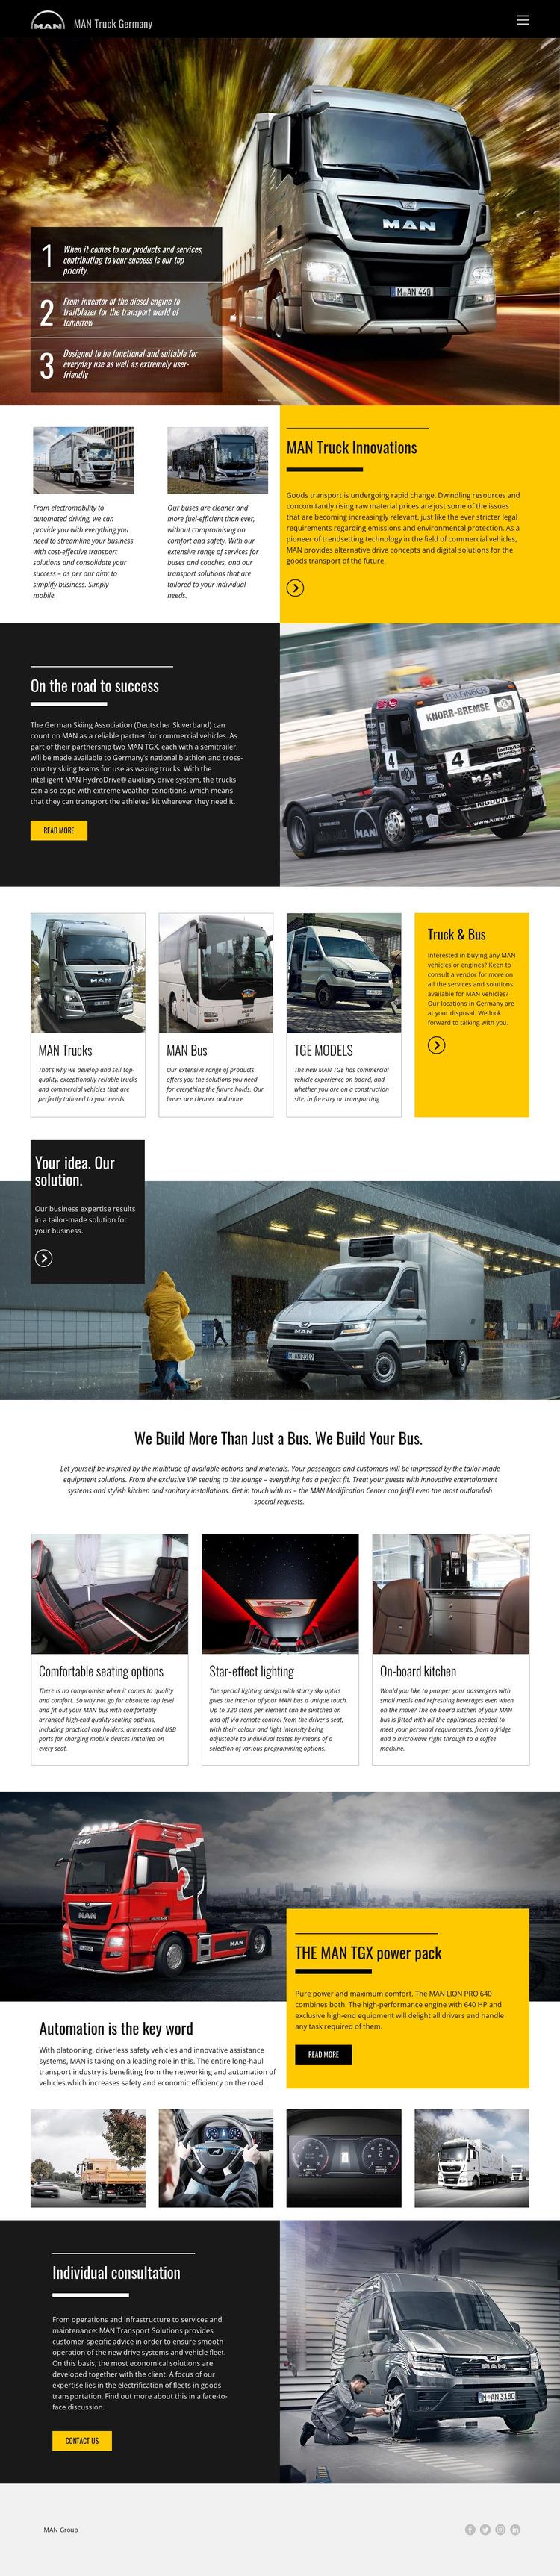 Man trucks for transportation HTML5 Template